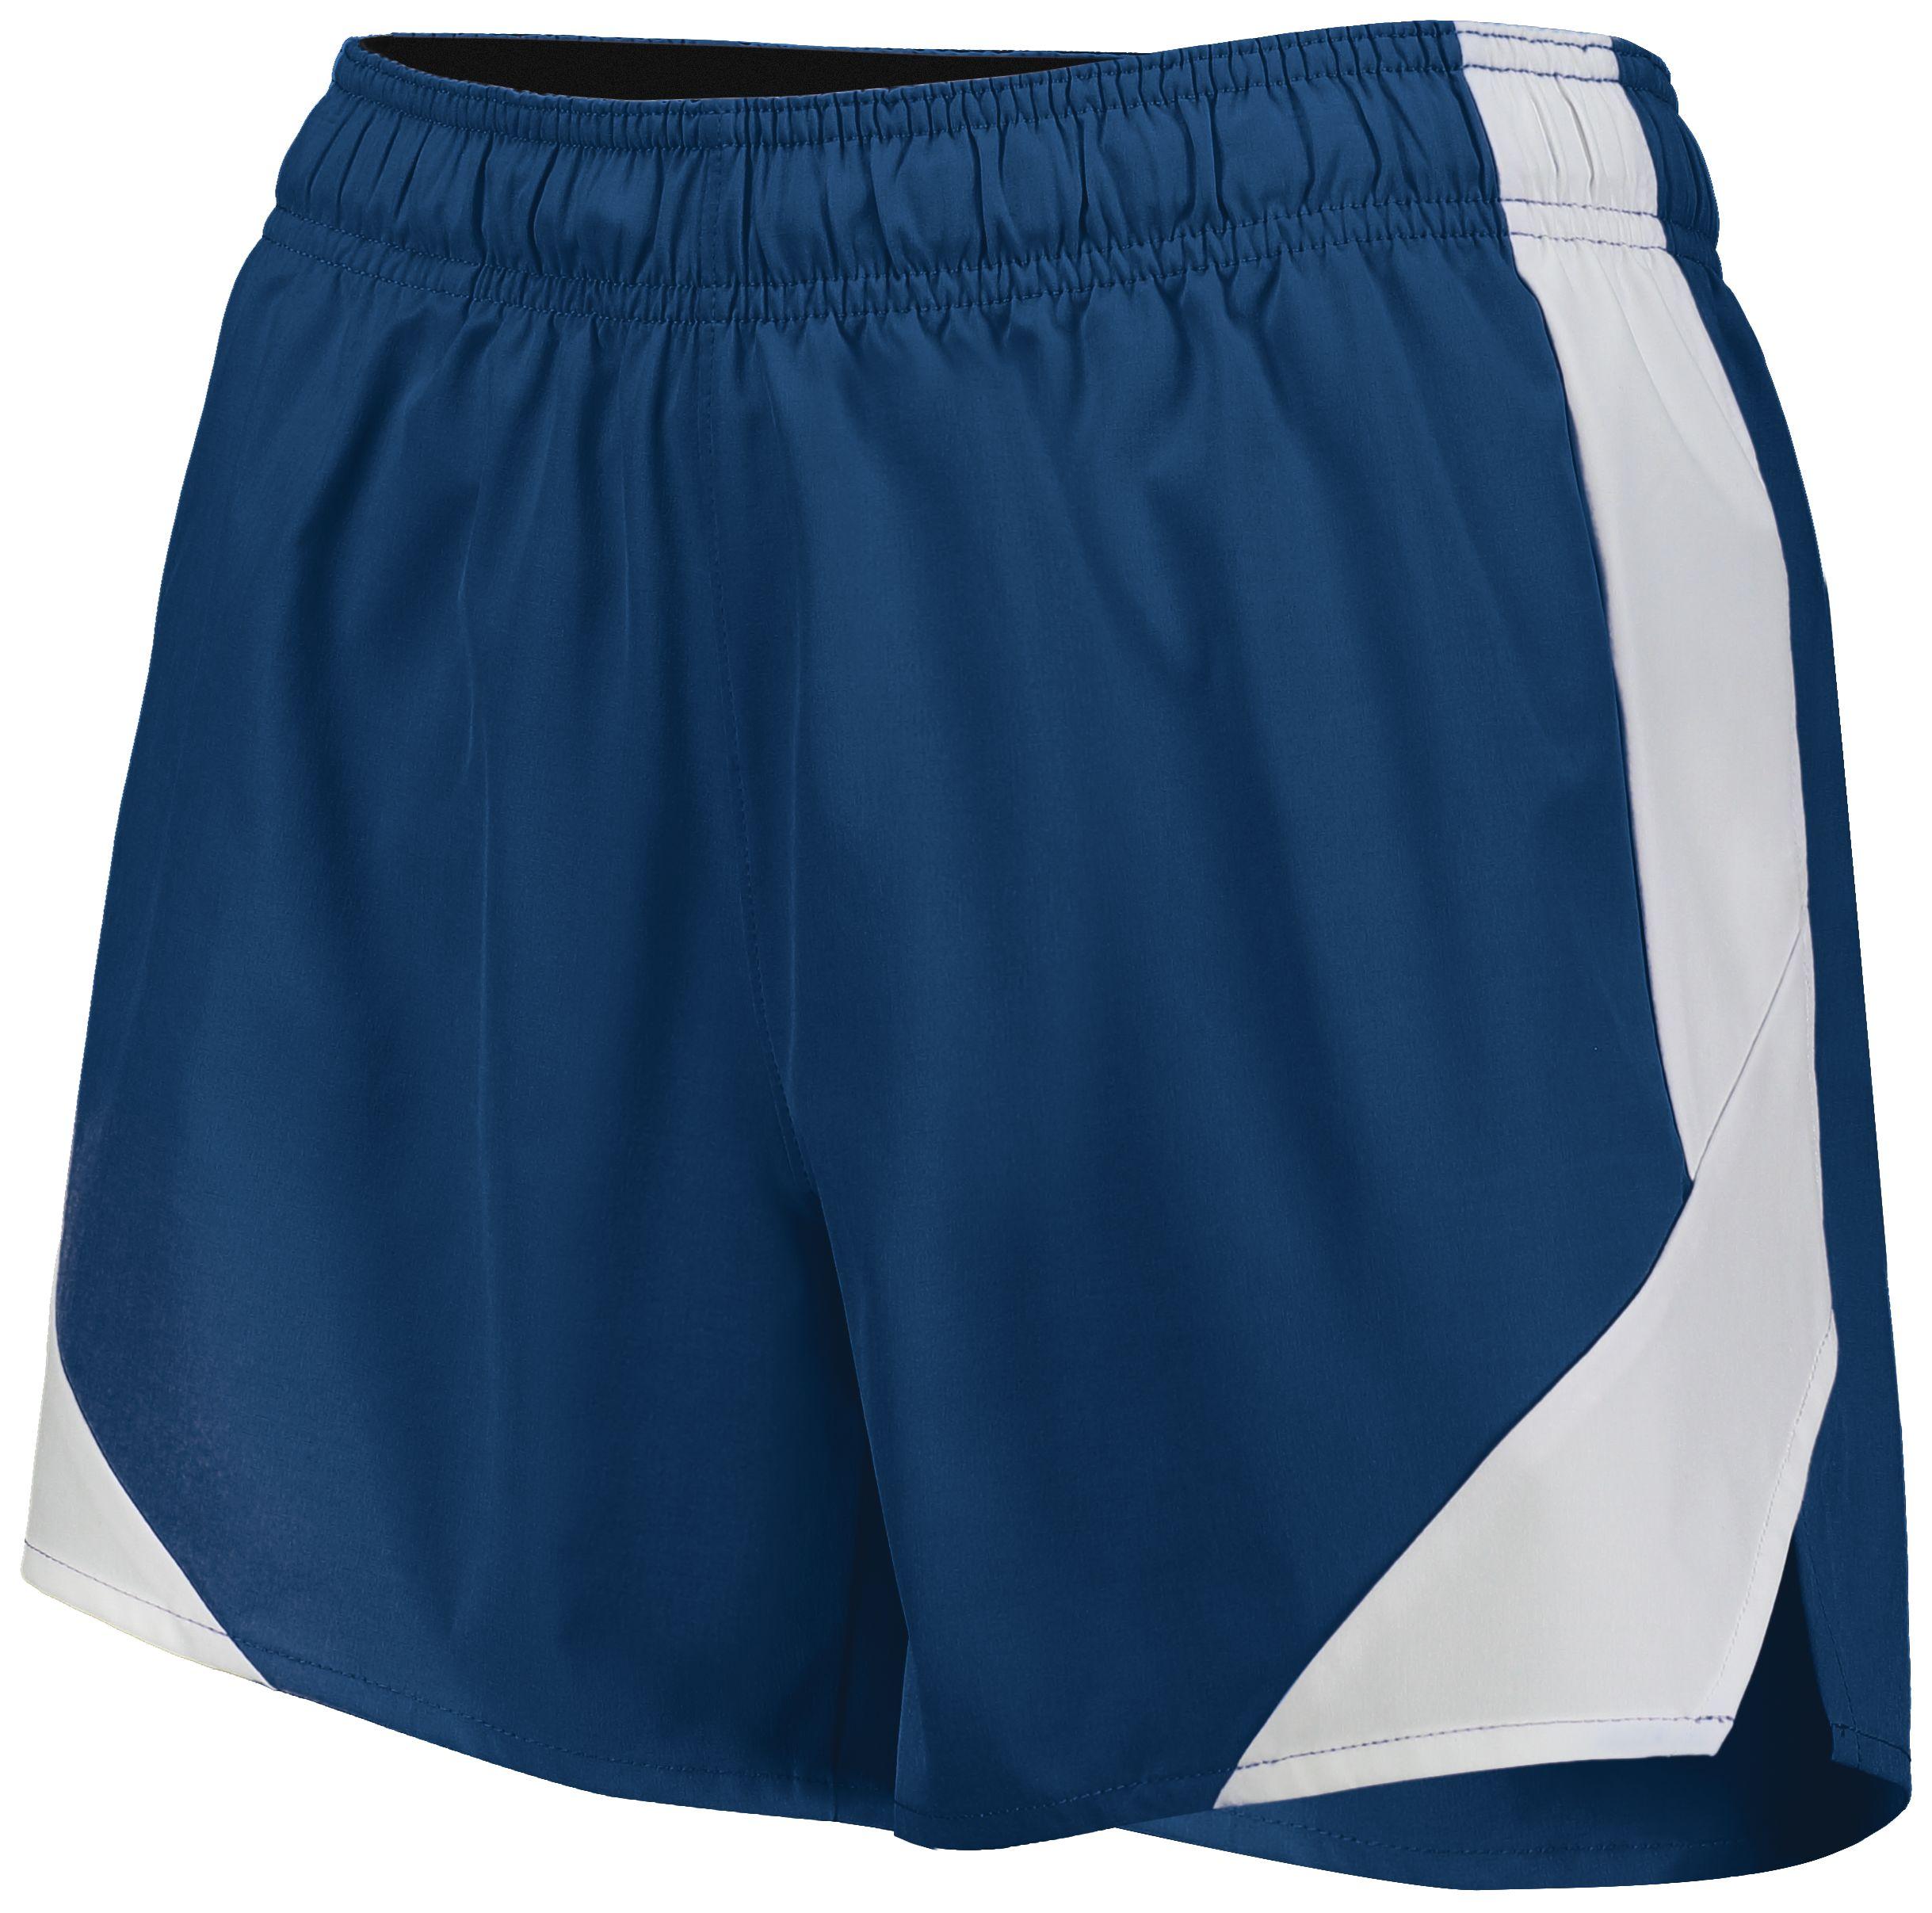 Ladies Olympus Shorts - NAVY/WHITE